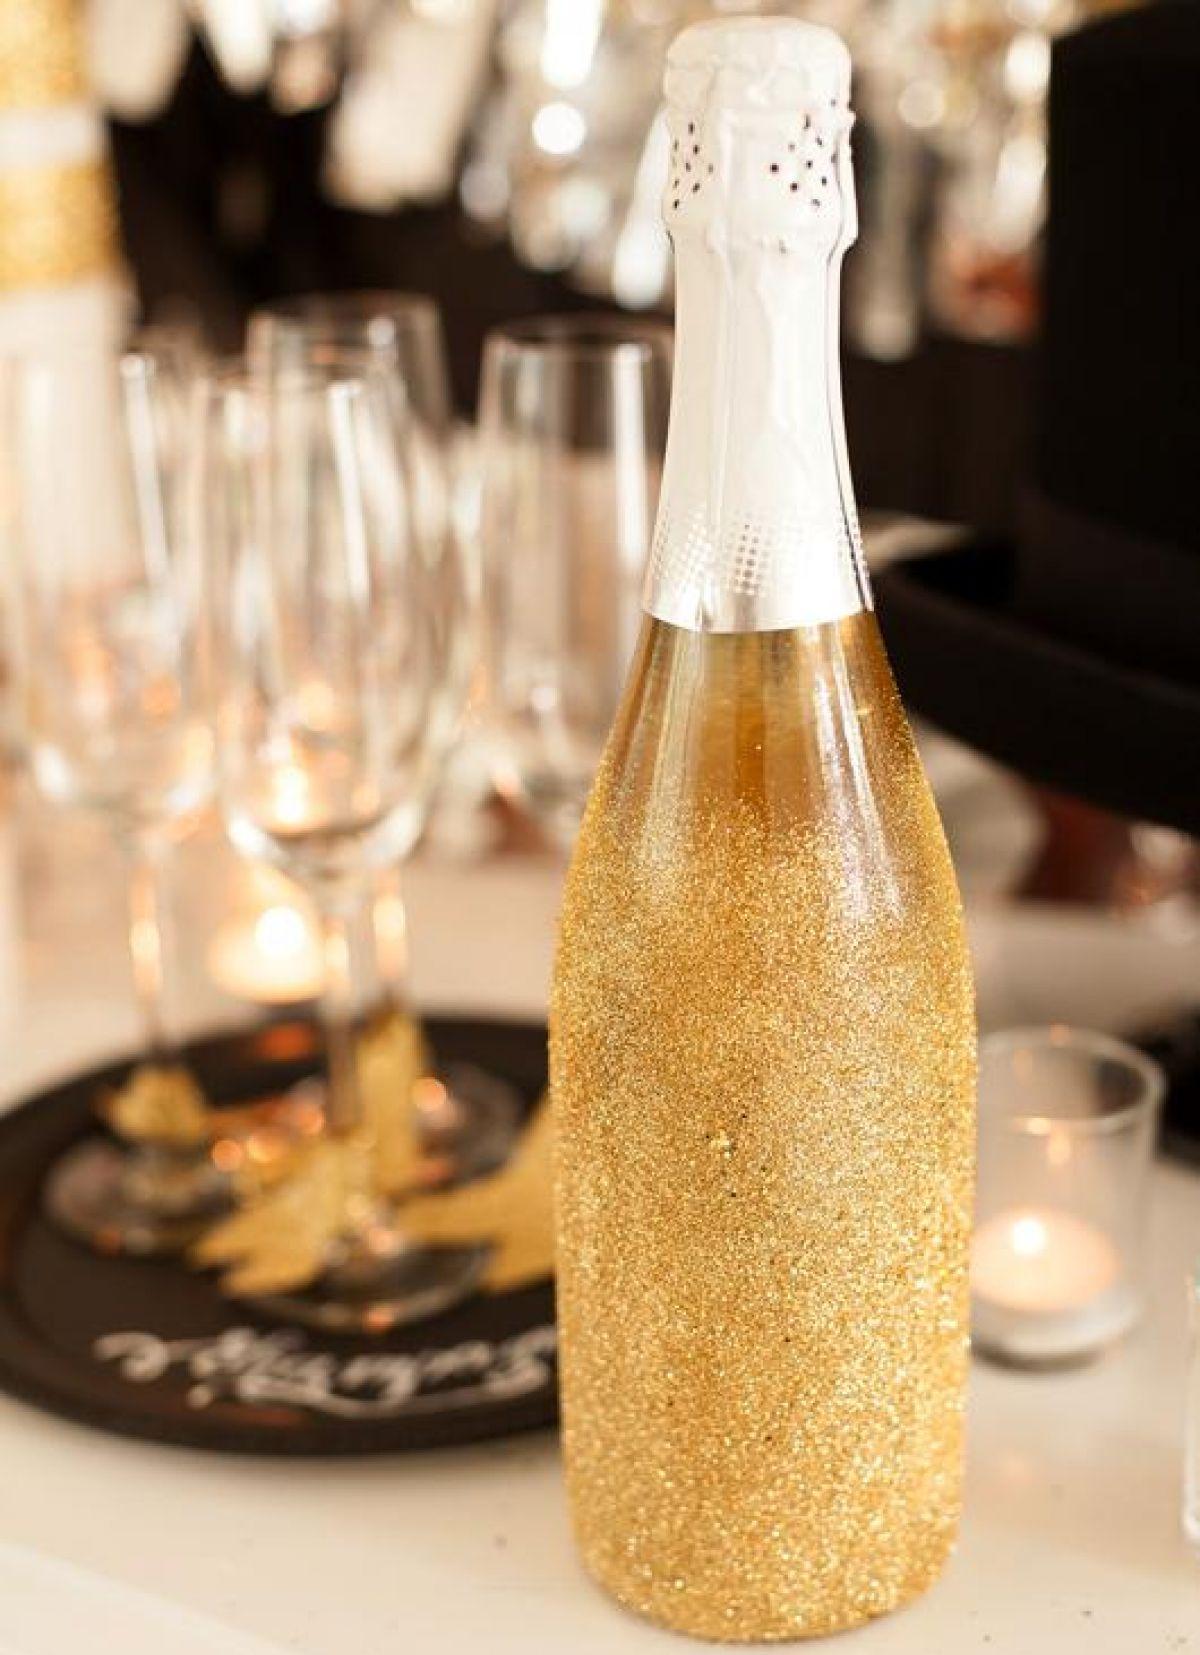 Декупаж бутылки шампанского на новогодний стол